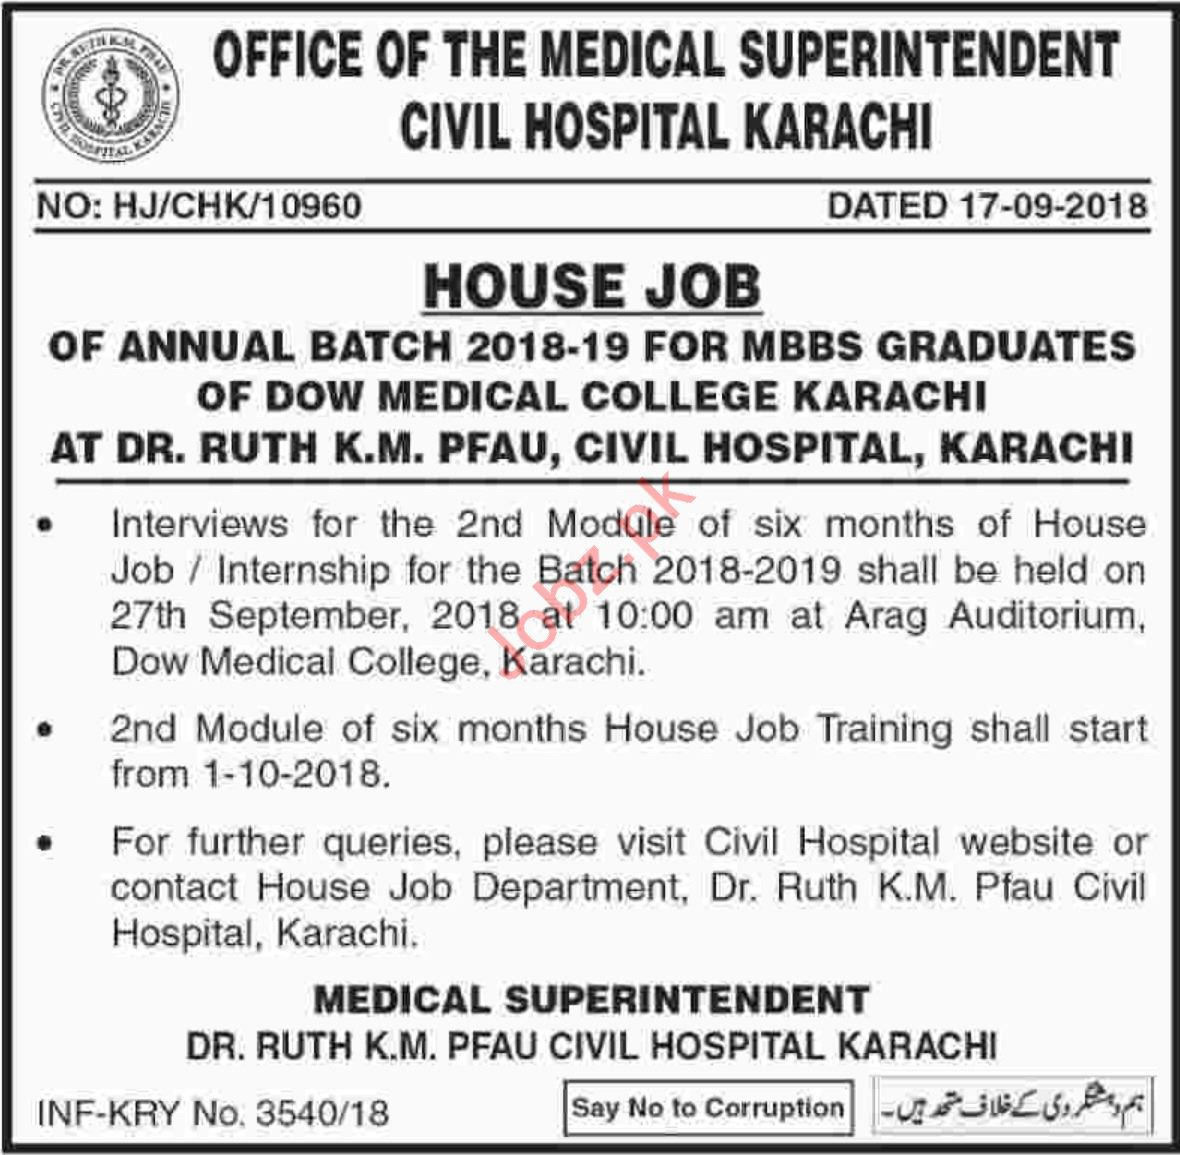 Dow Medical College Karachi House Jobs 2018